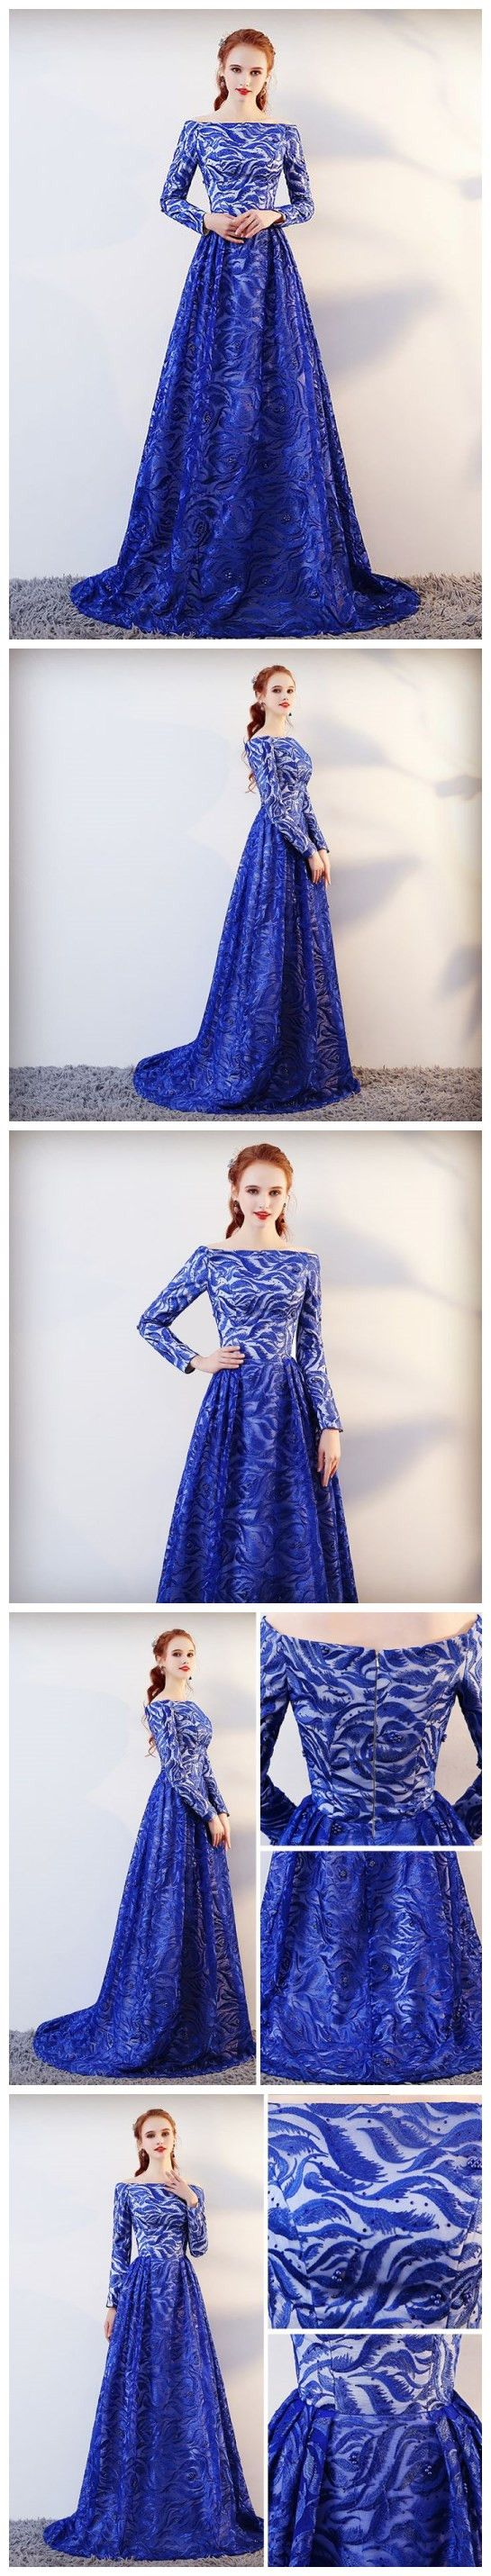 blue prom dresses long bateau lace long sleeve prom dress